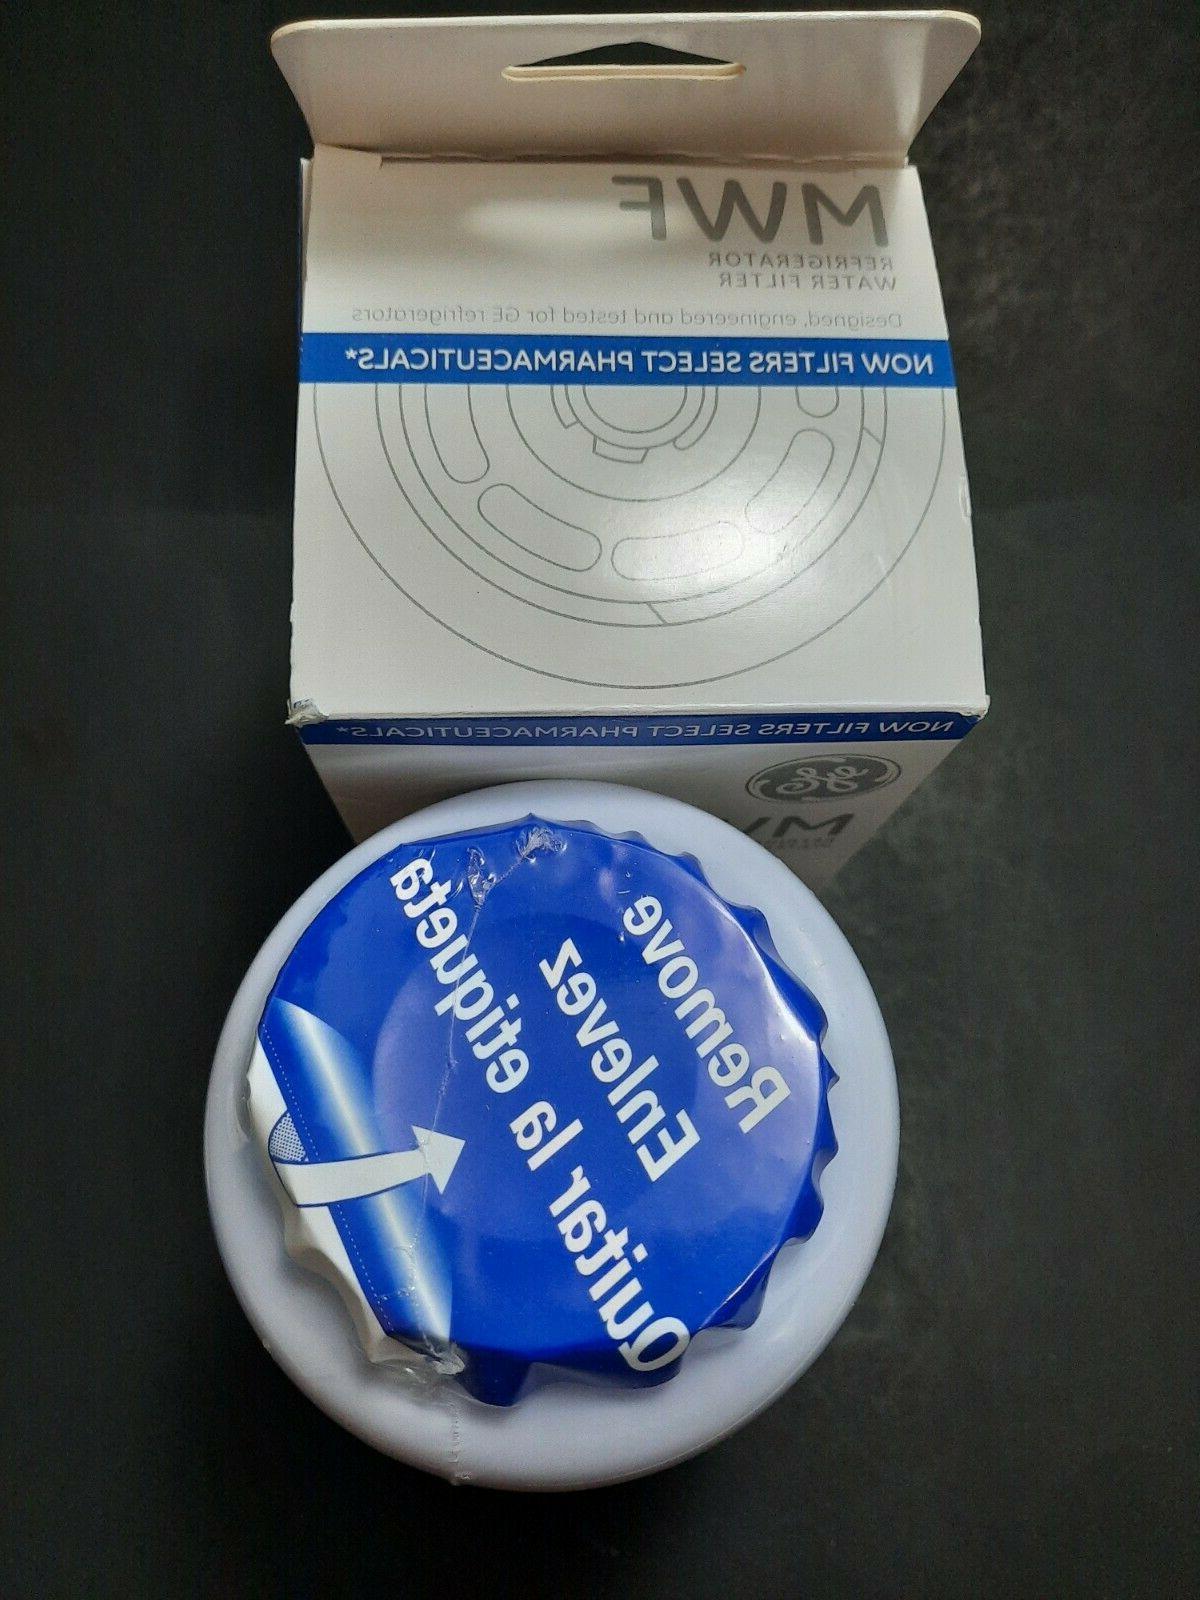 GE MWF Replacement Water Filter Genuine OEM